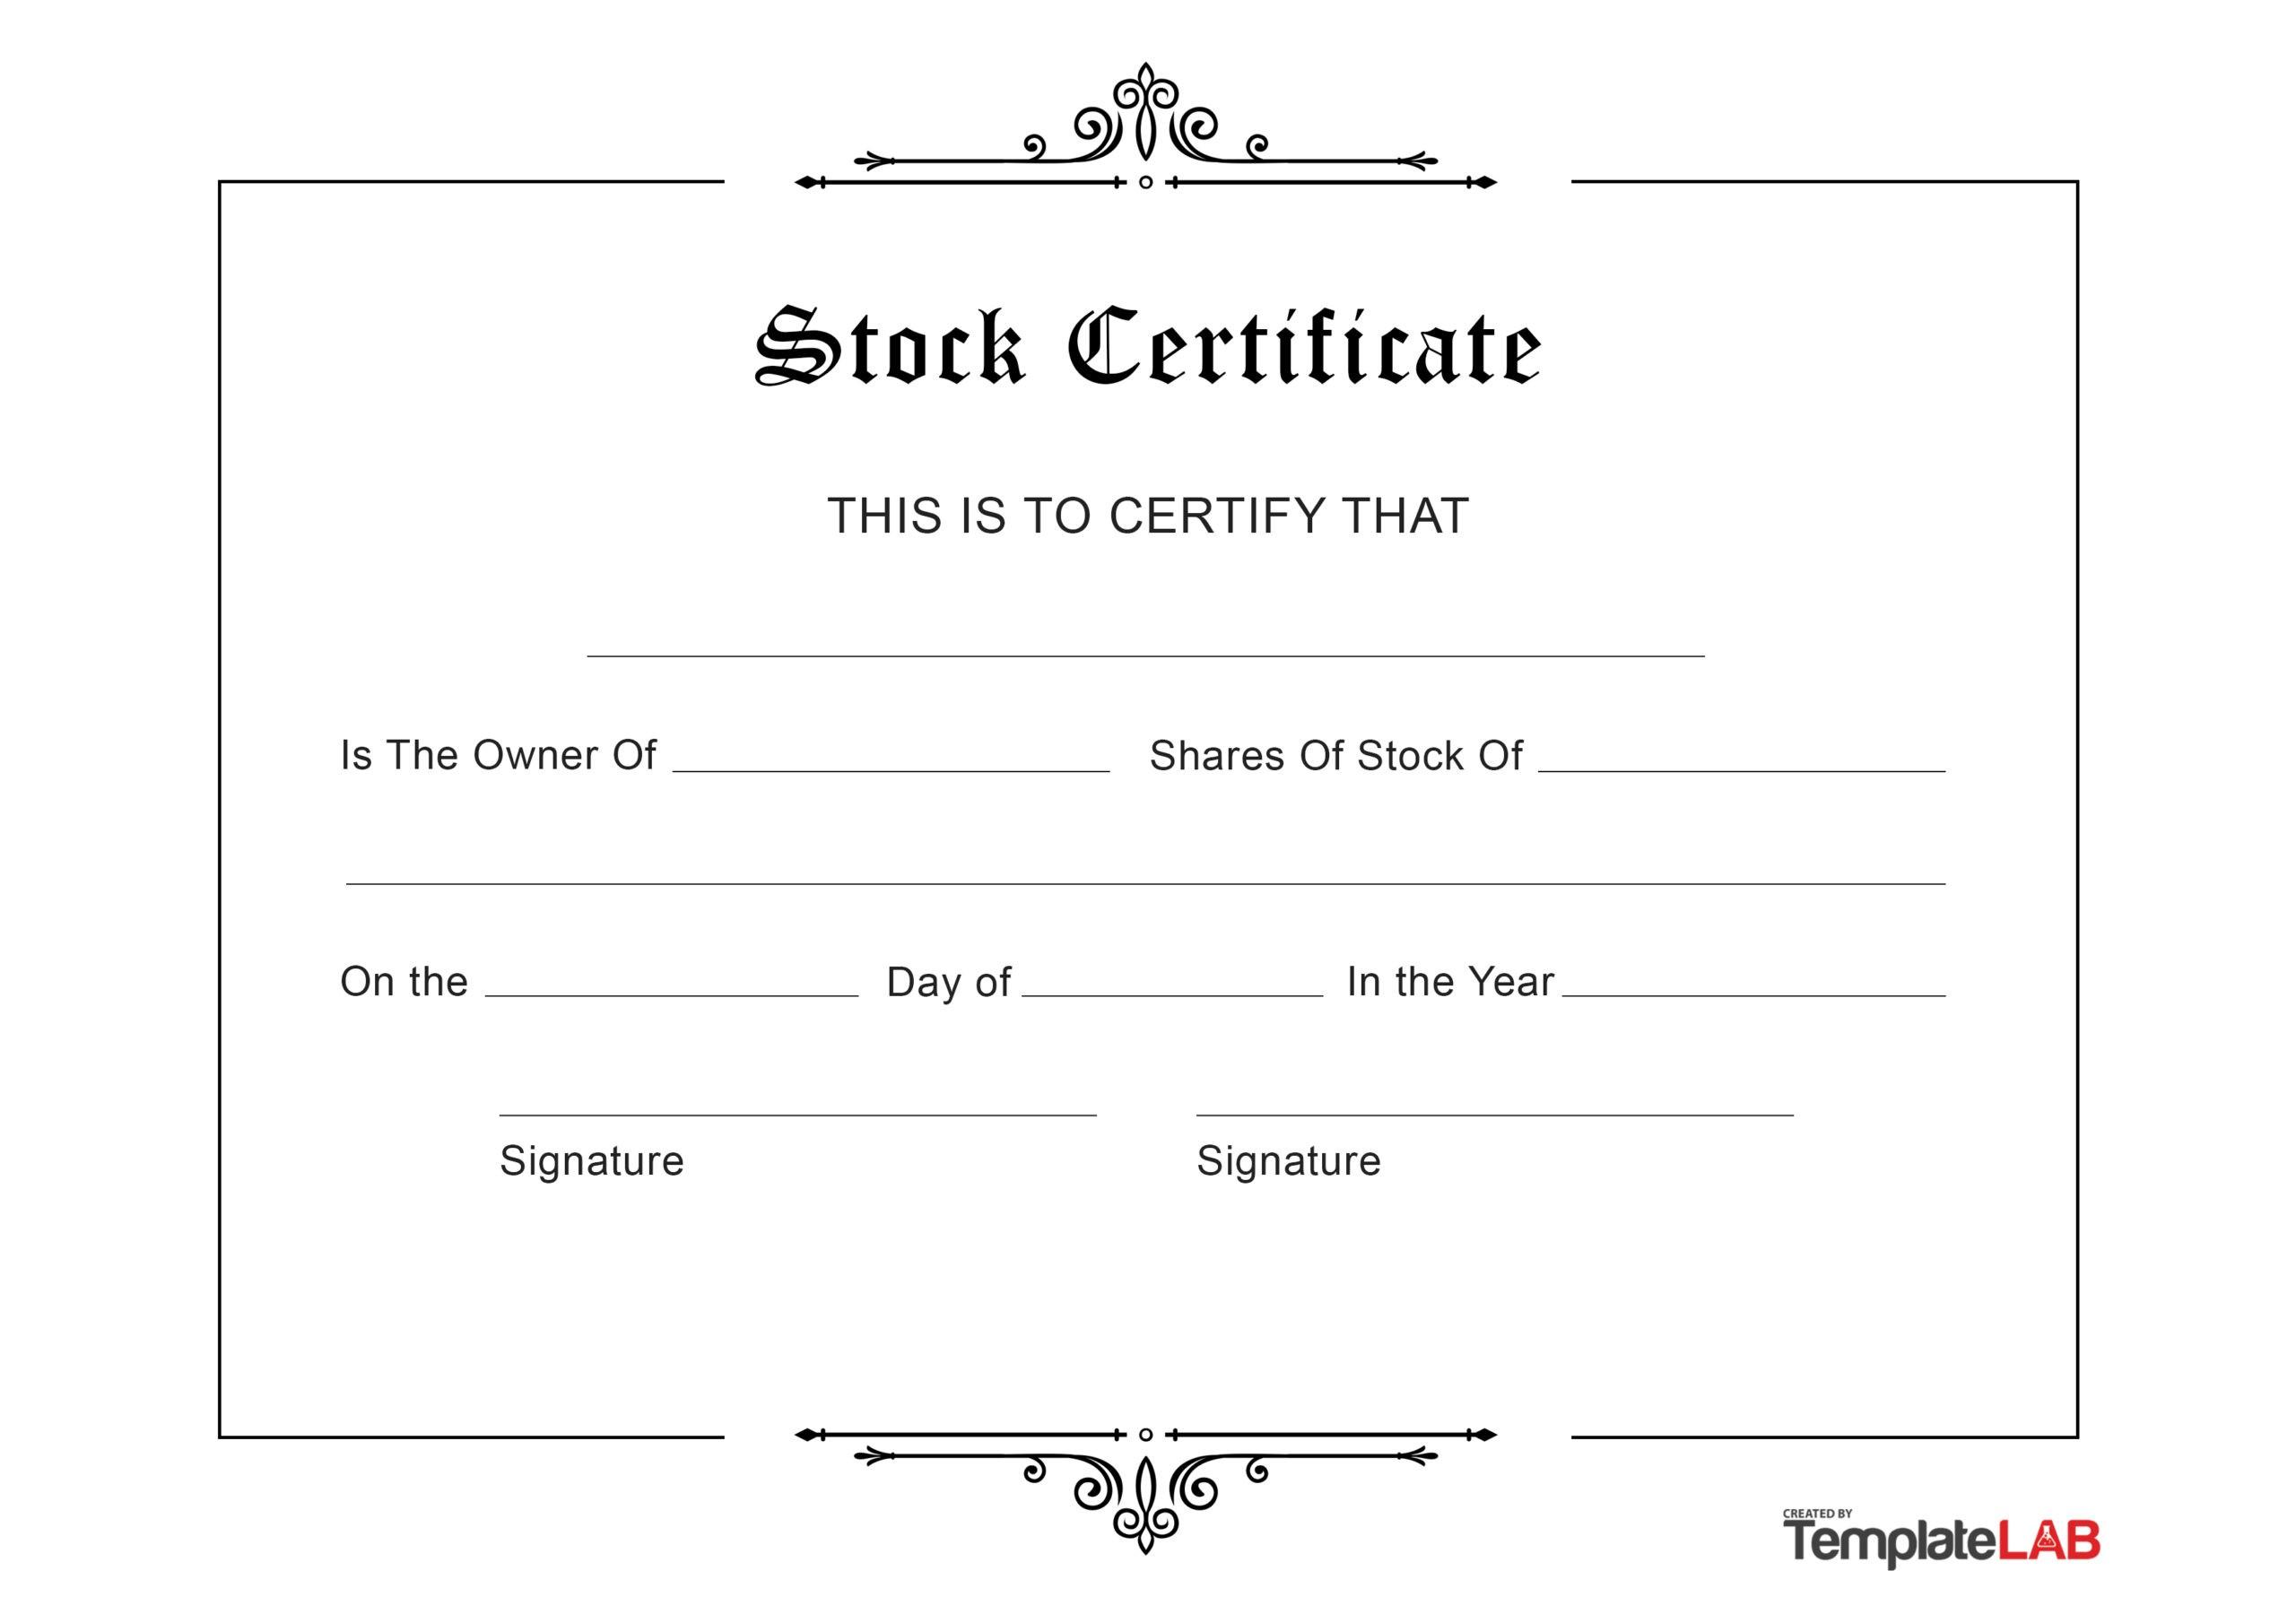 Free Stock Certificate v2